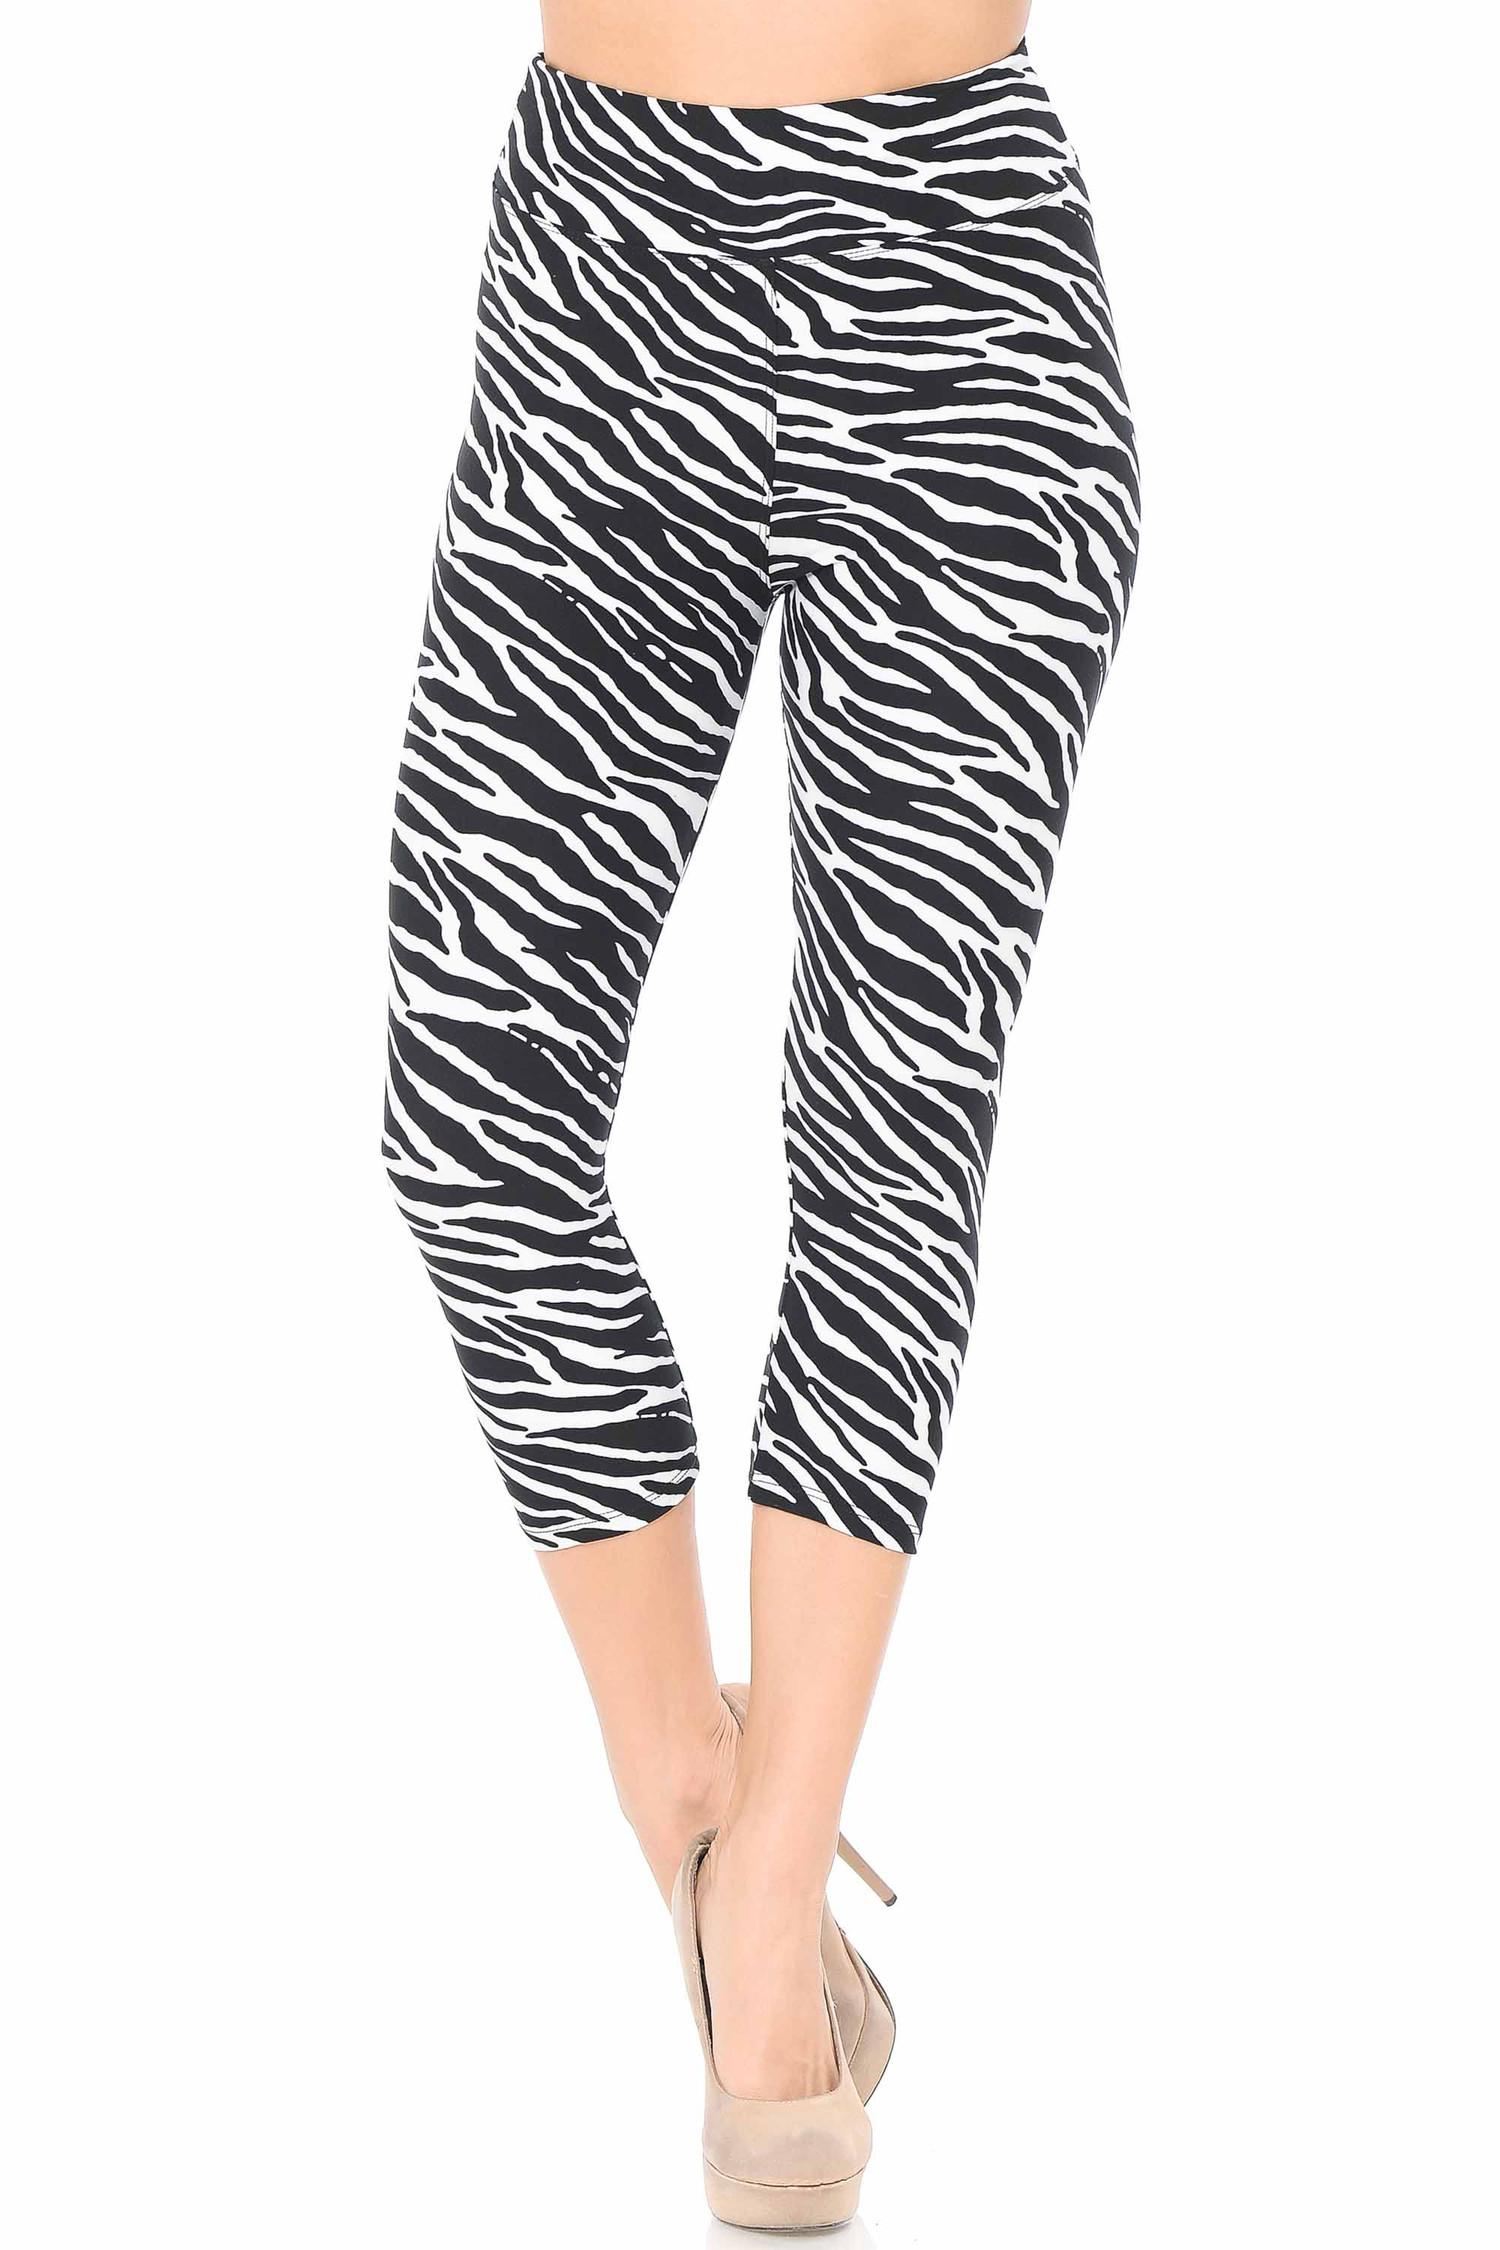 Brushed  Zebra Print Plus Size Capris - 3 Inch